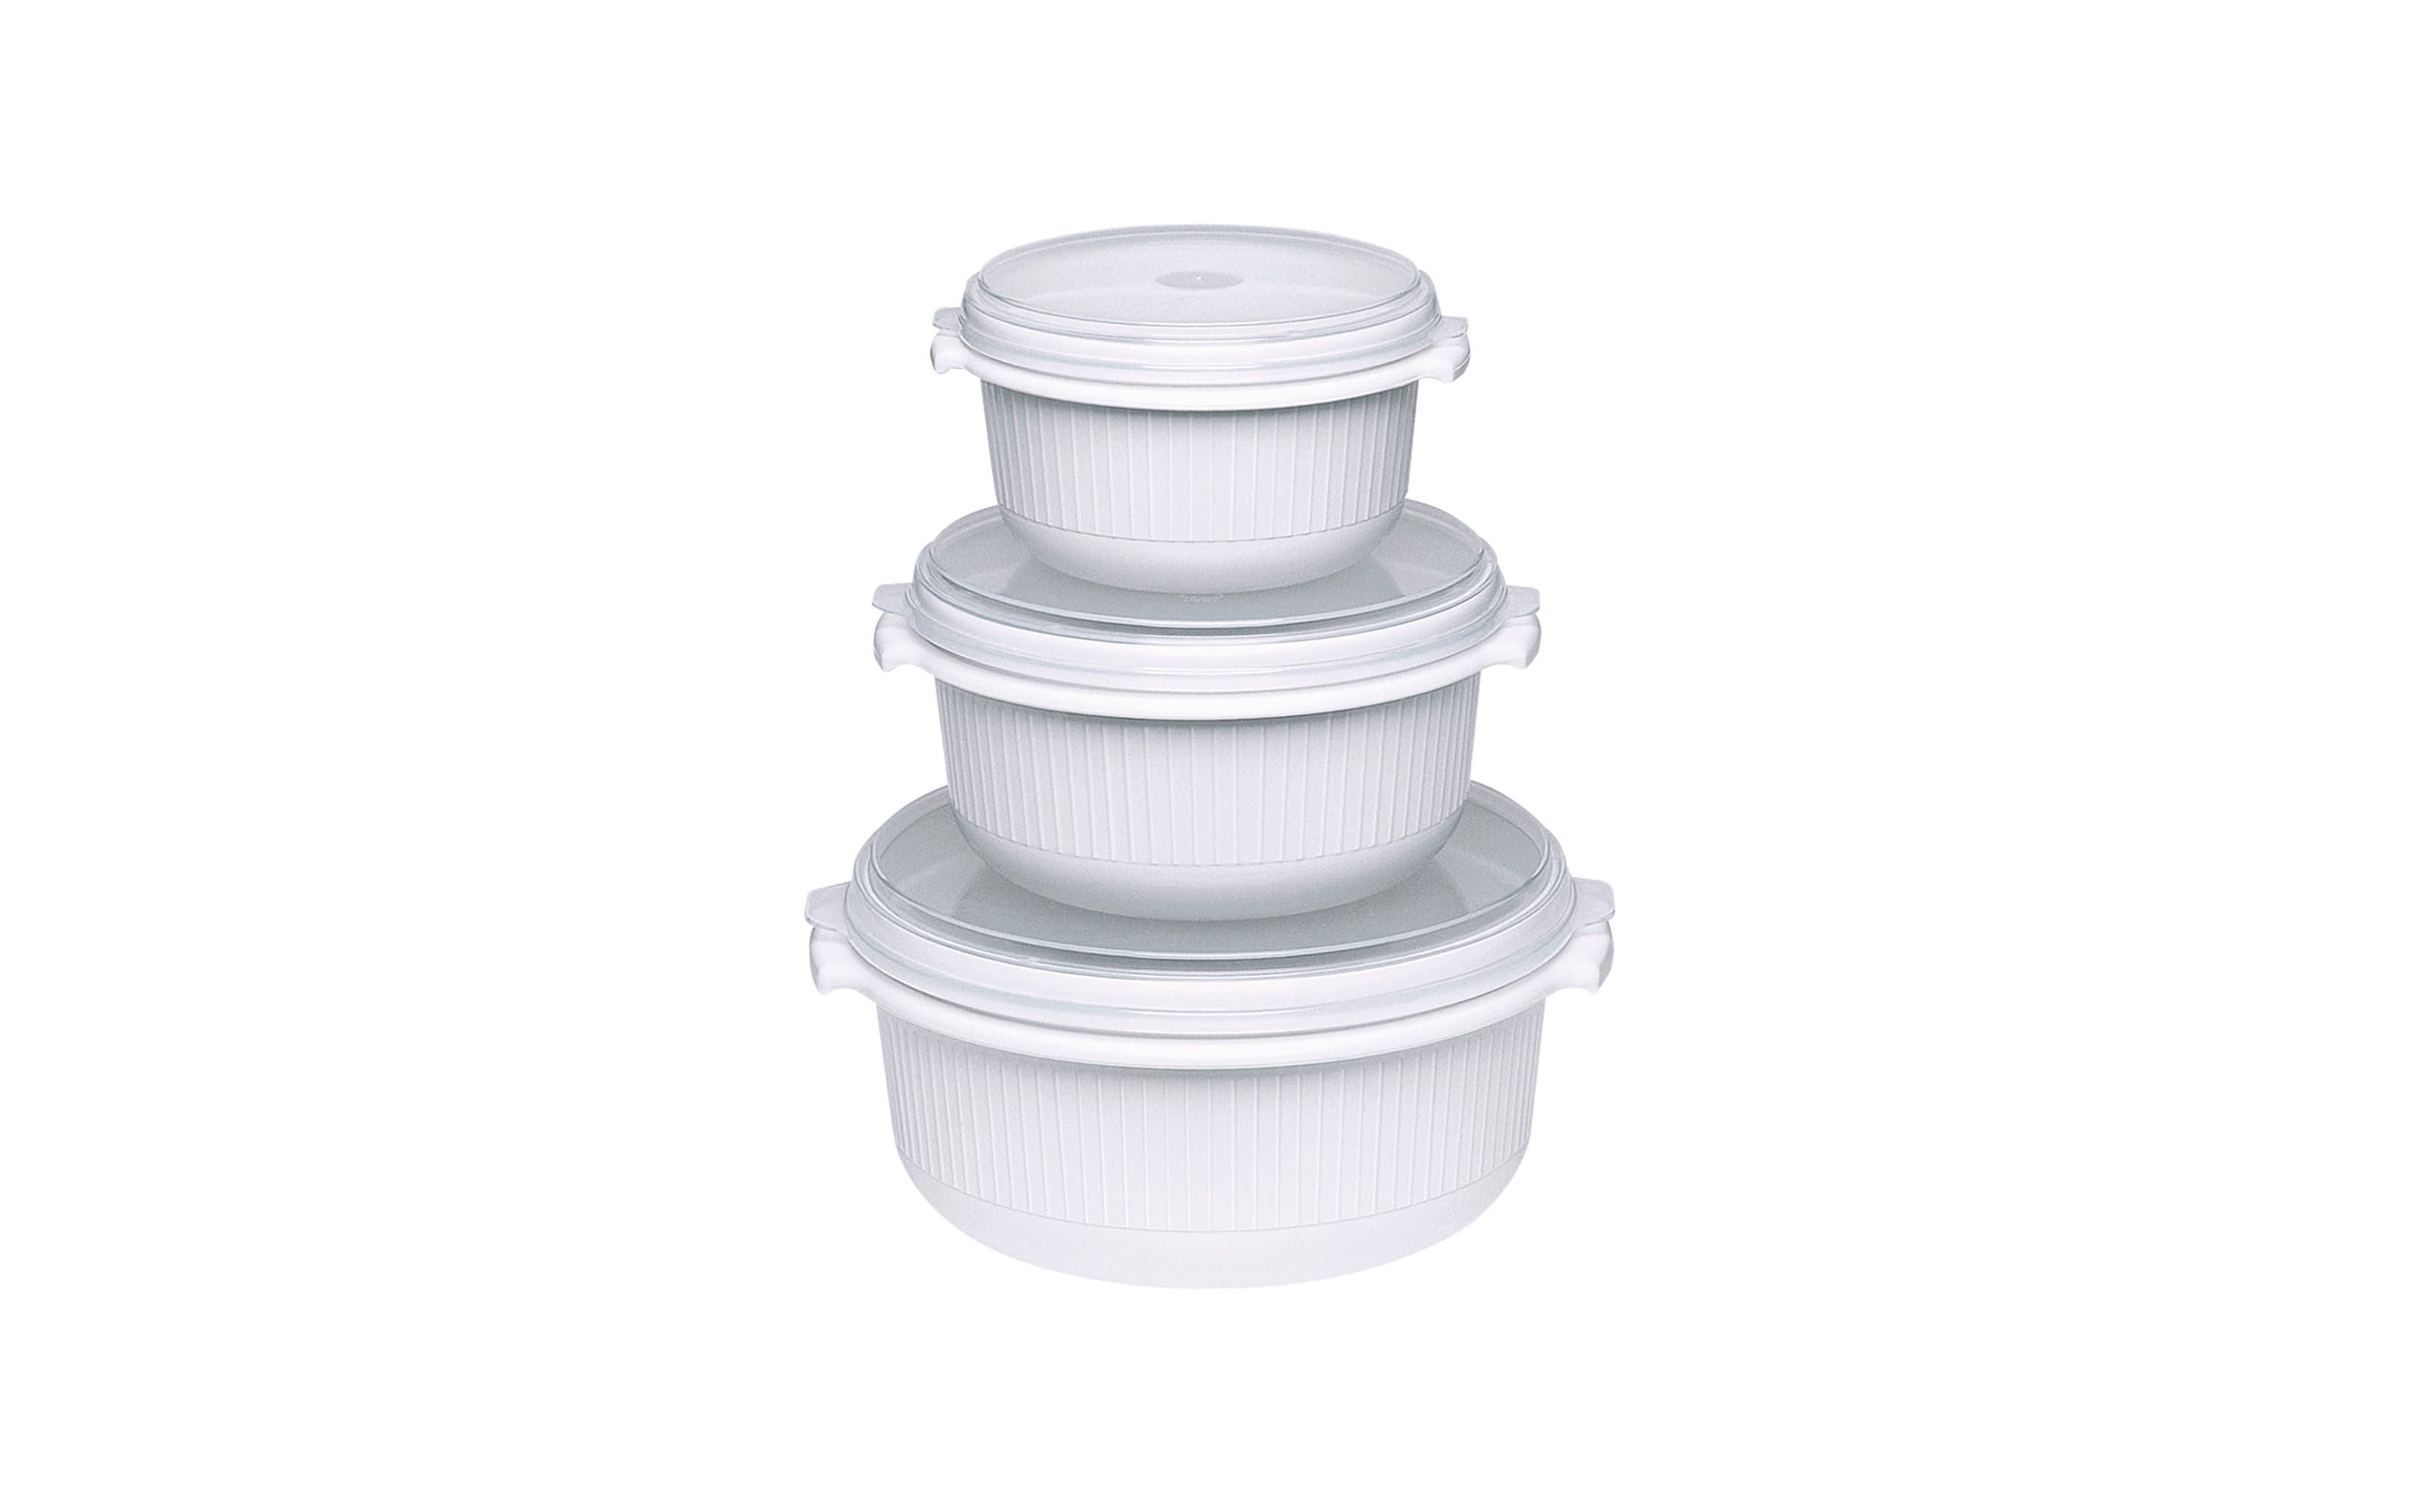 Mikrowellen-Set Micro Family in weiß, 3-teilig